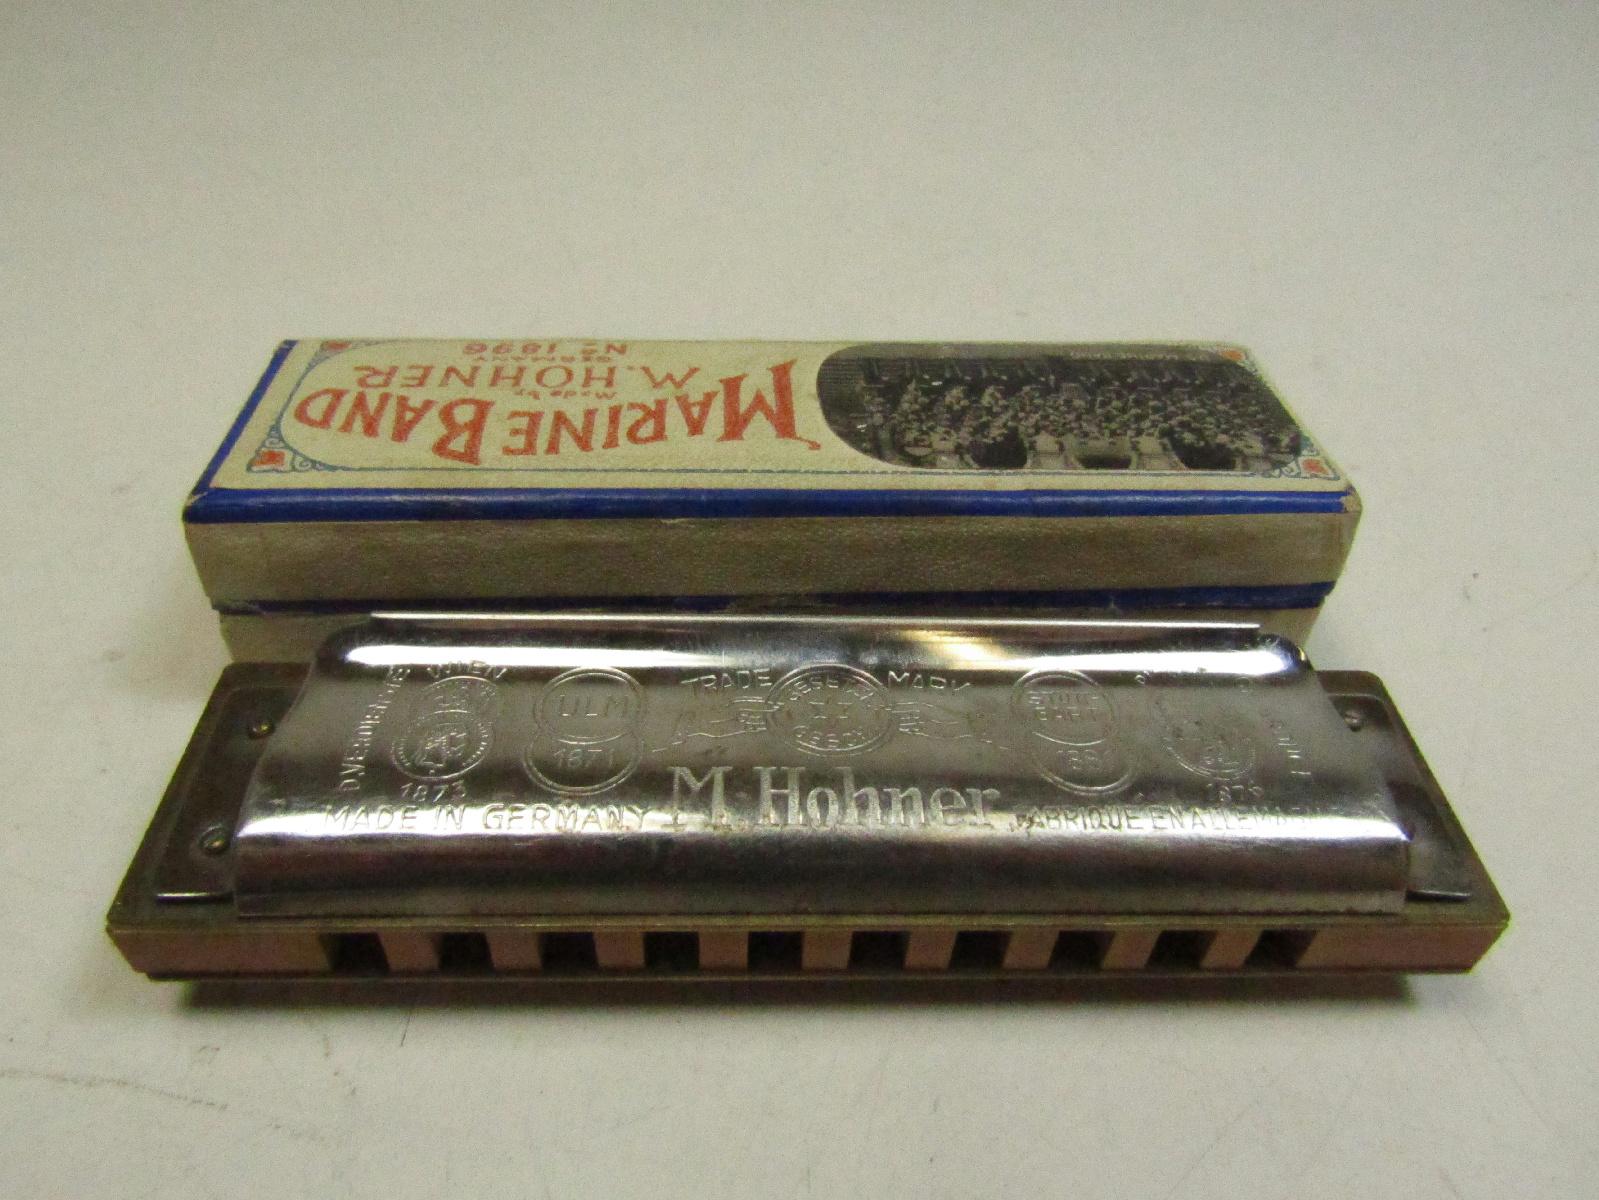 vintage m hohner 1896 marine band harmonica musical instrument key of g in box ebay. Black Bedroom Furniture Sets. Home Design Ideas